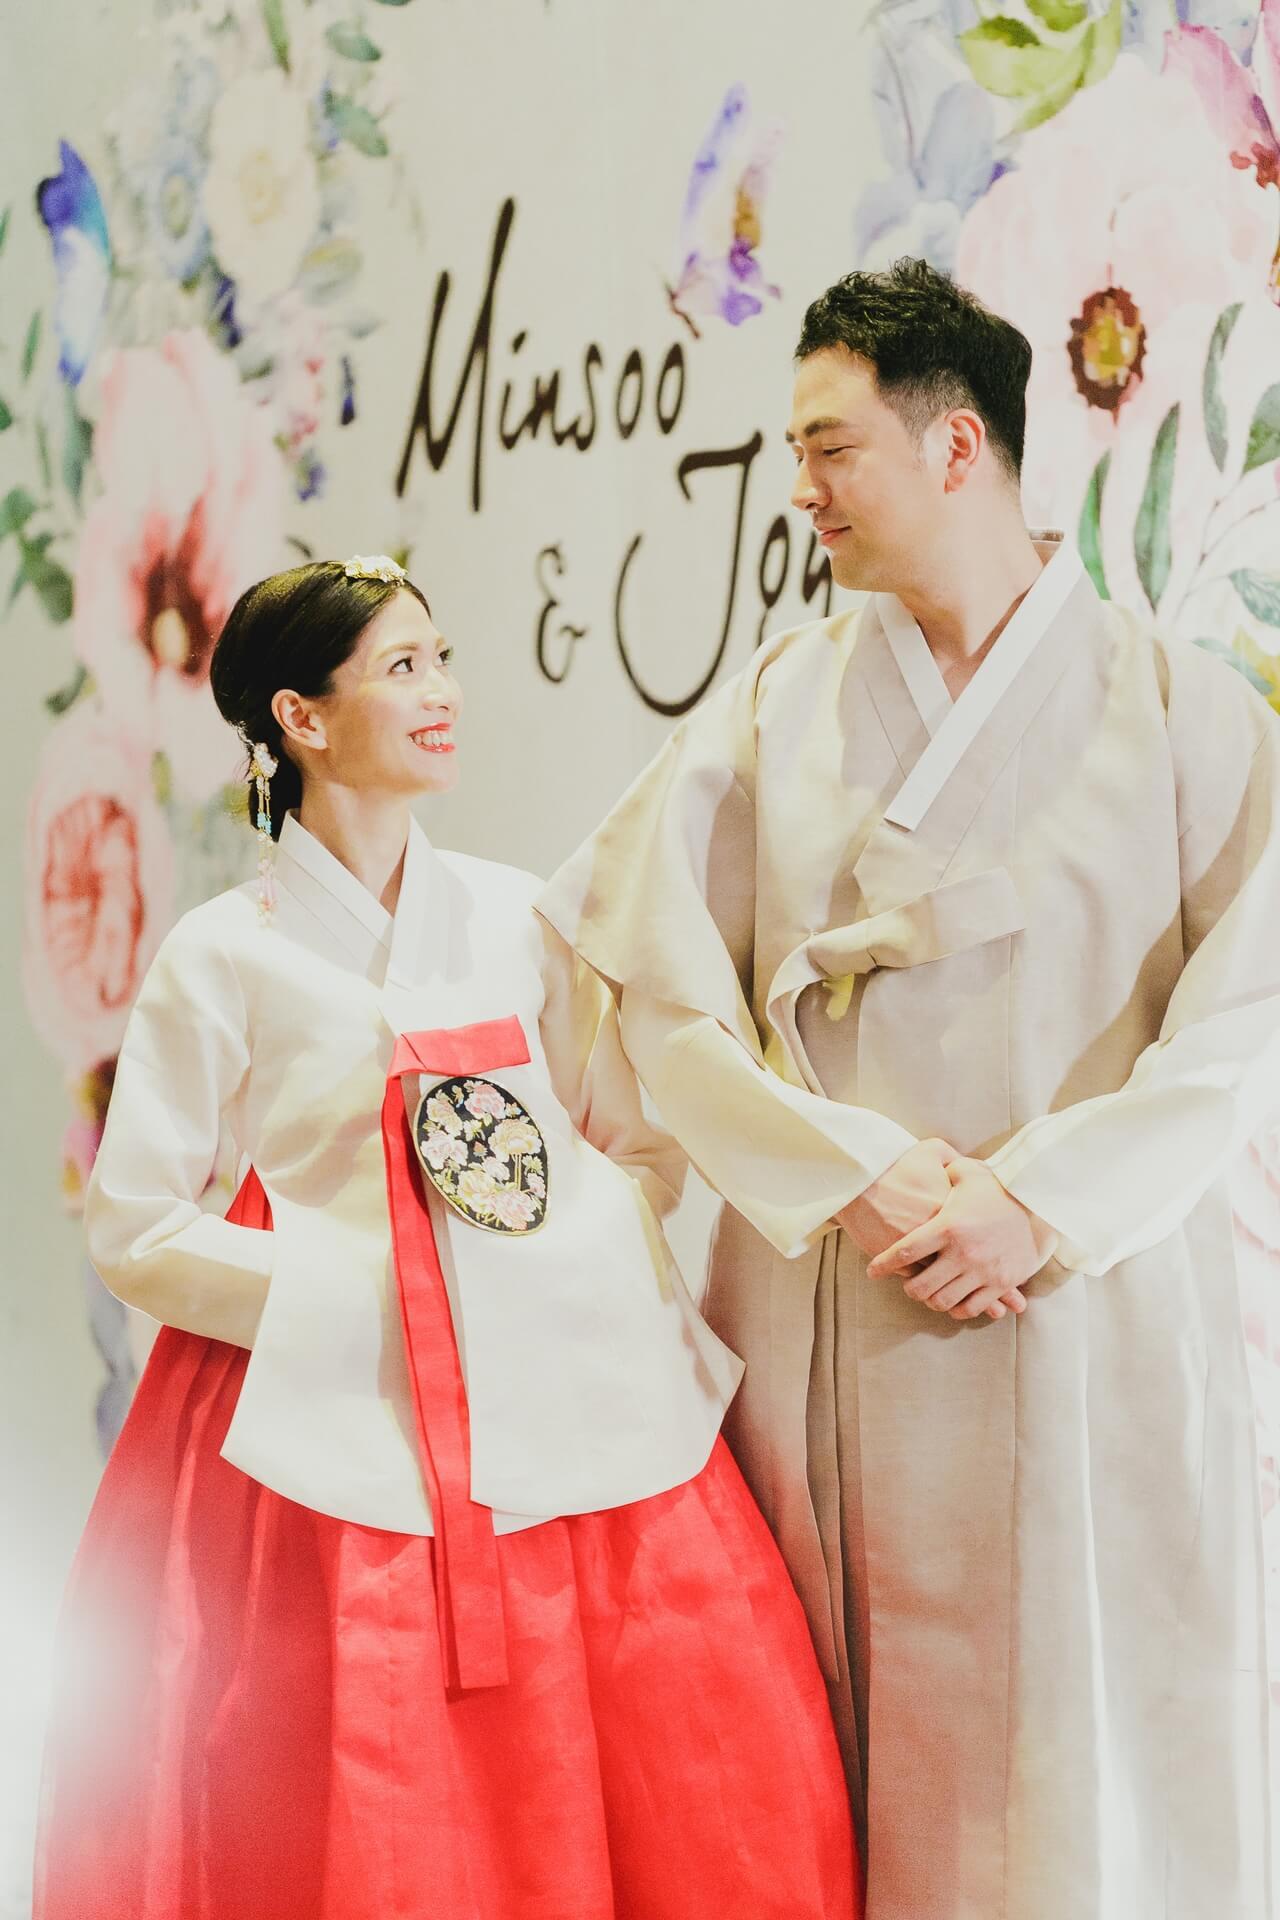 misslala 婚禮紀錄 婚禮紀實 韓國婚禮 萬豪婚禮 萬豪儀式 推薦婚攝 底片風格 電影風格 -0060.jpg